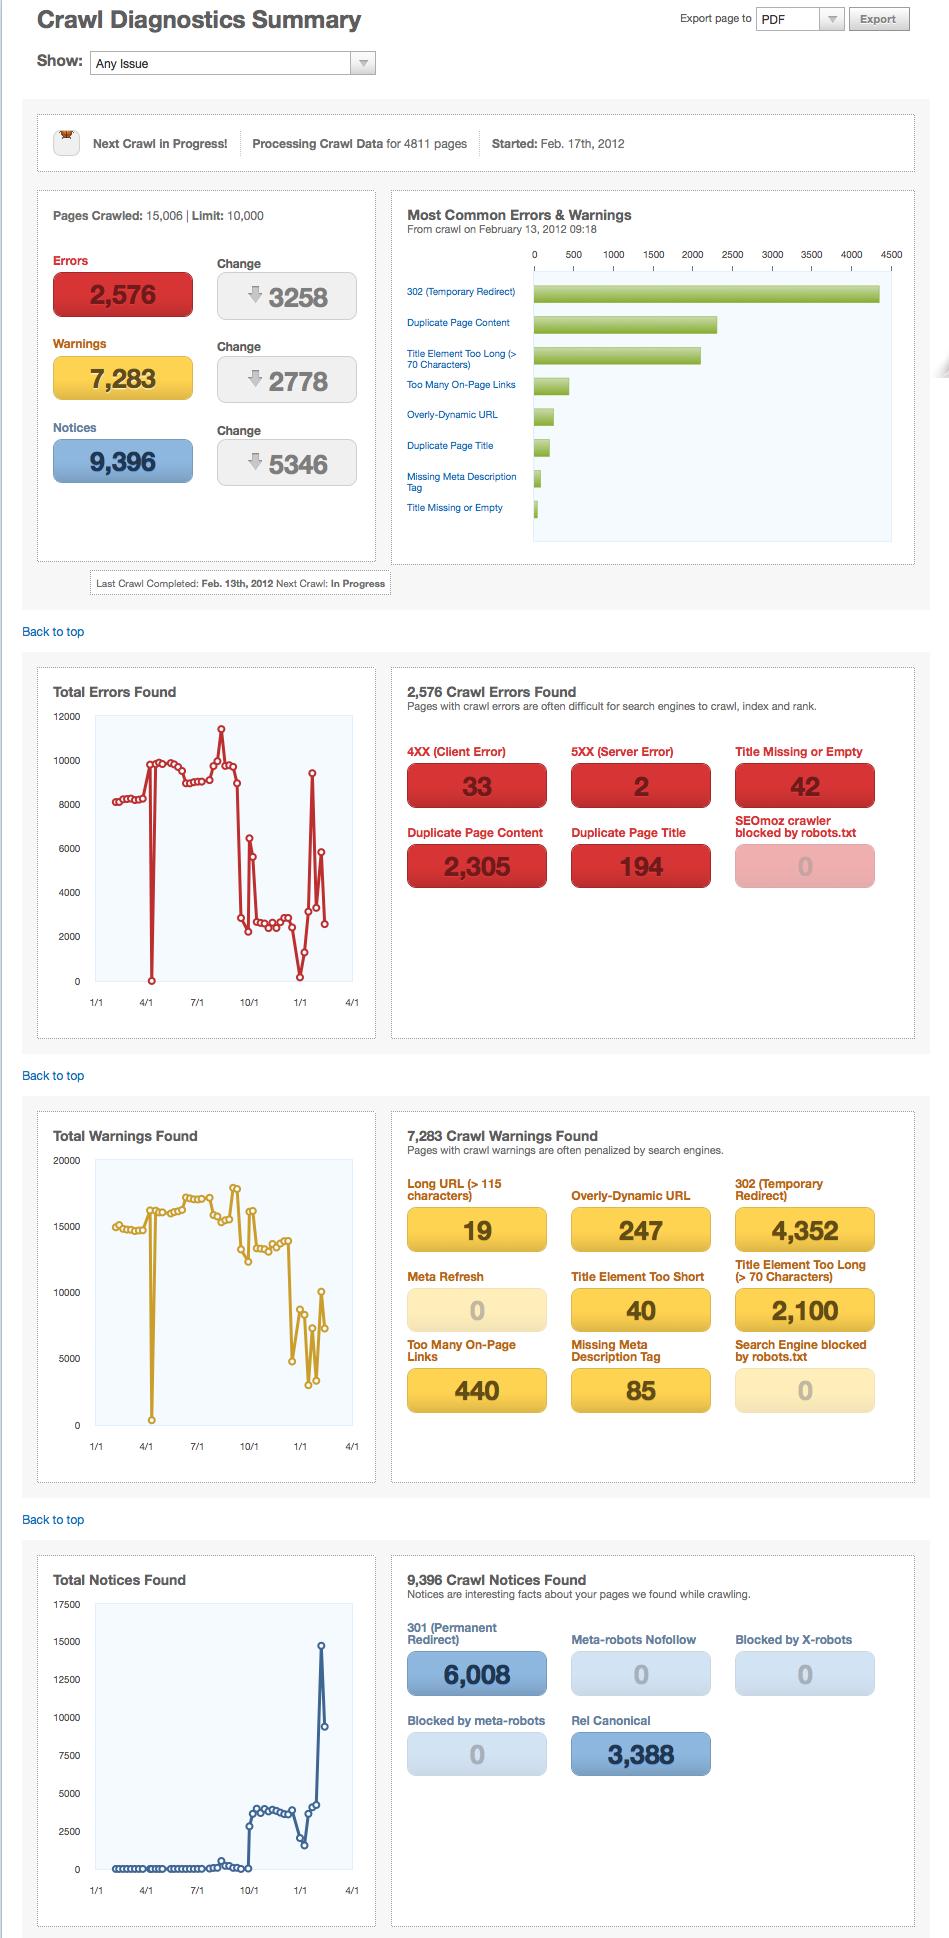 Customer Paradigm Crawl Diagnostics Report